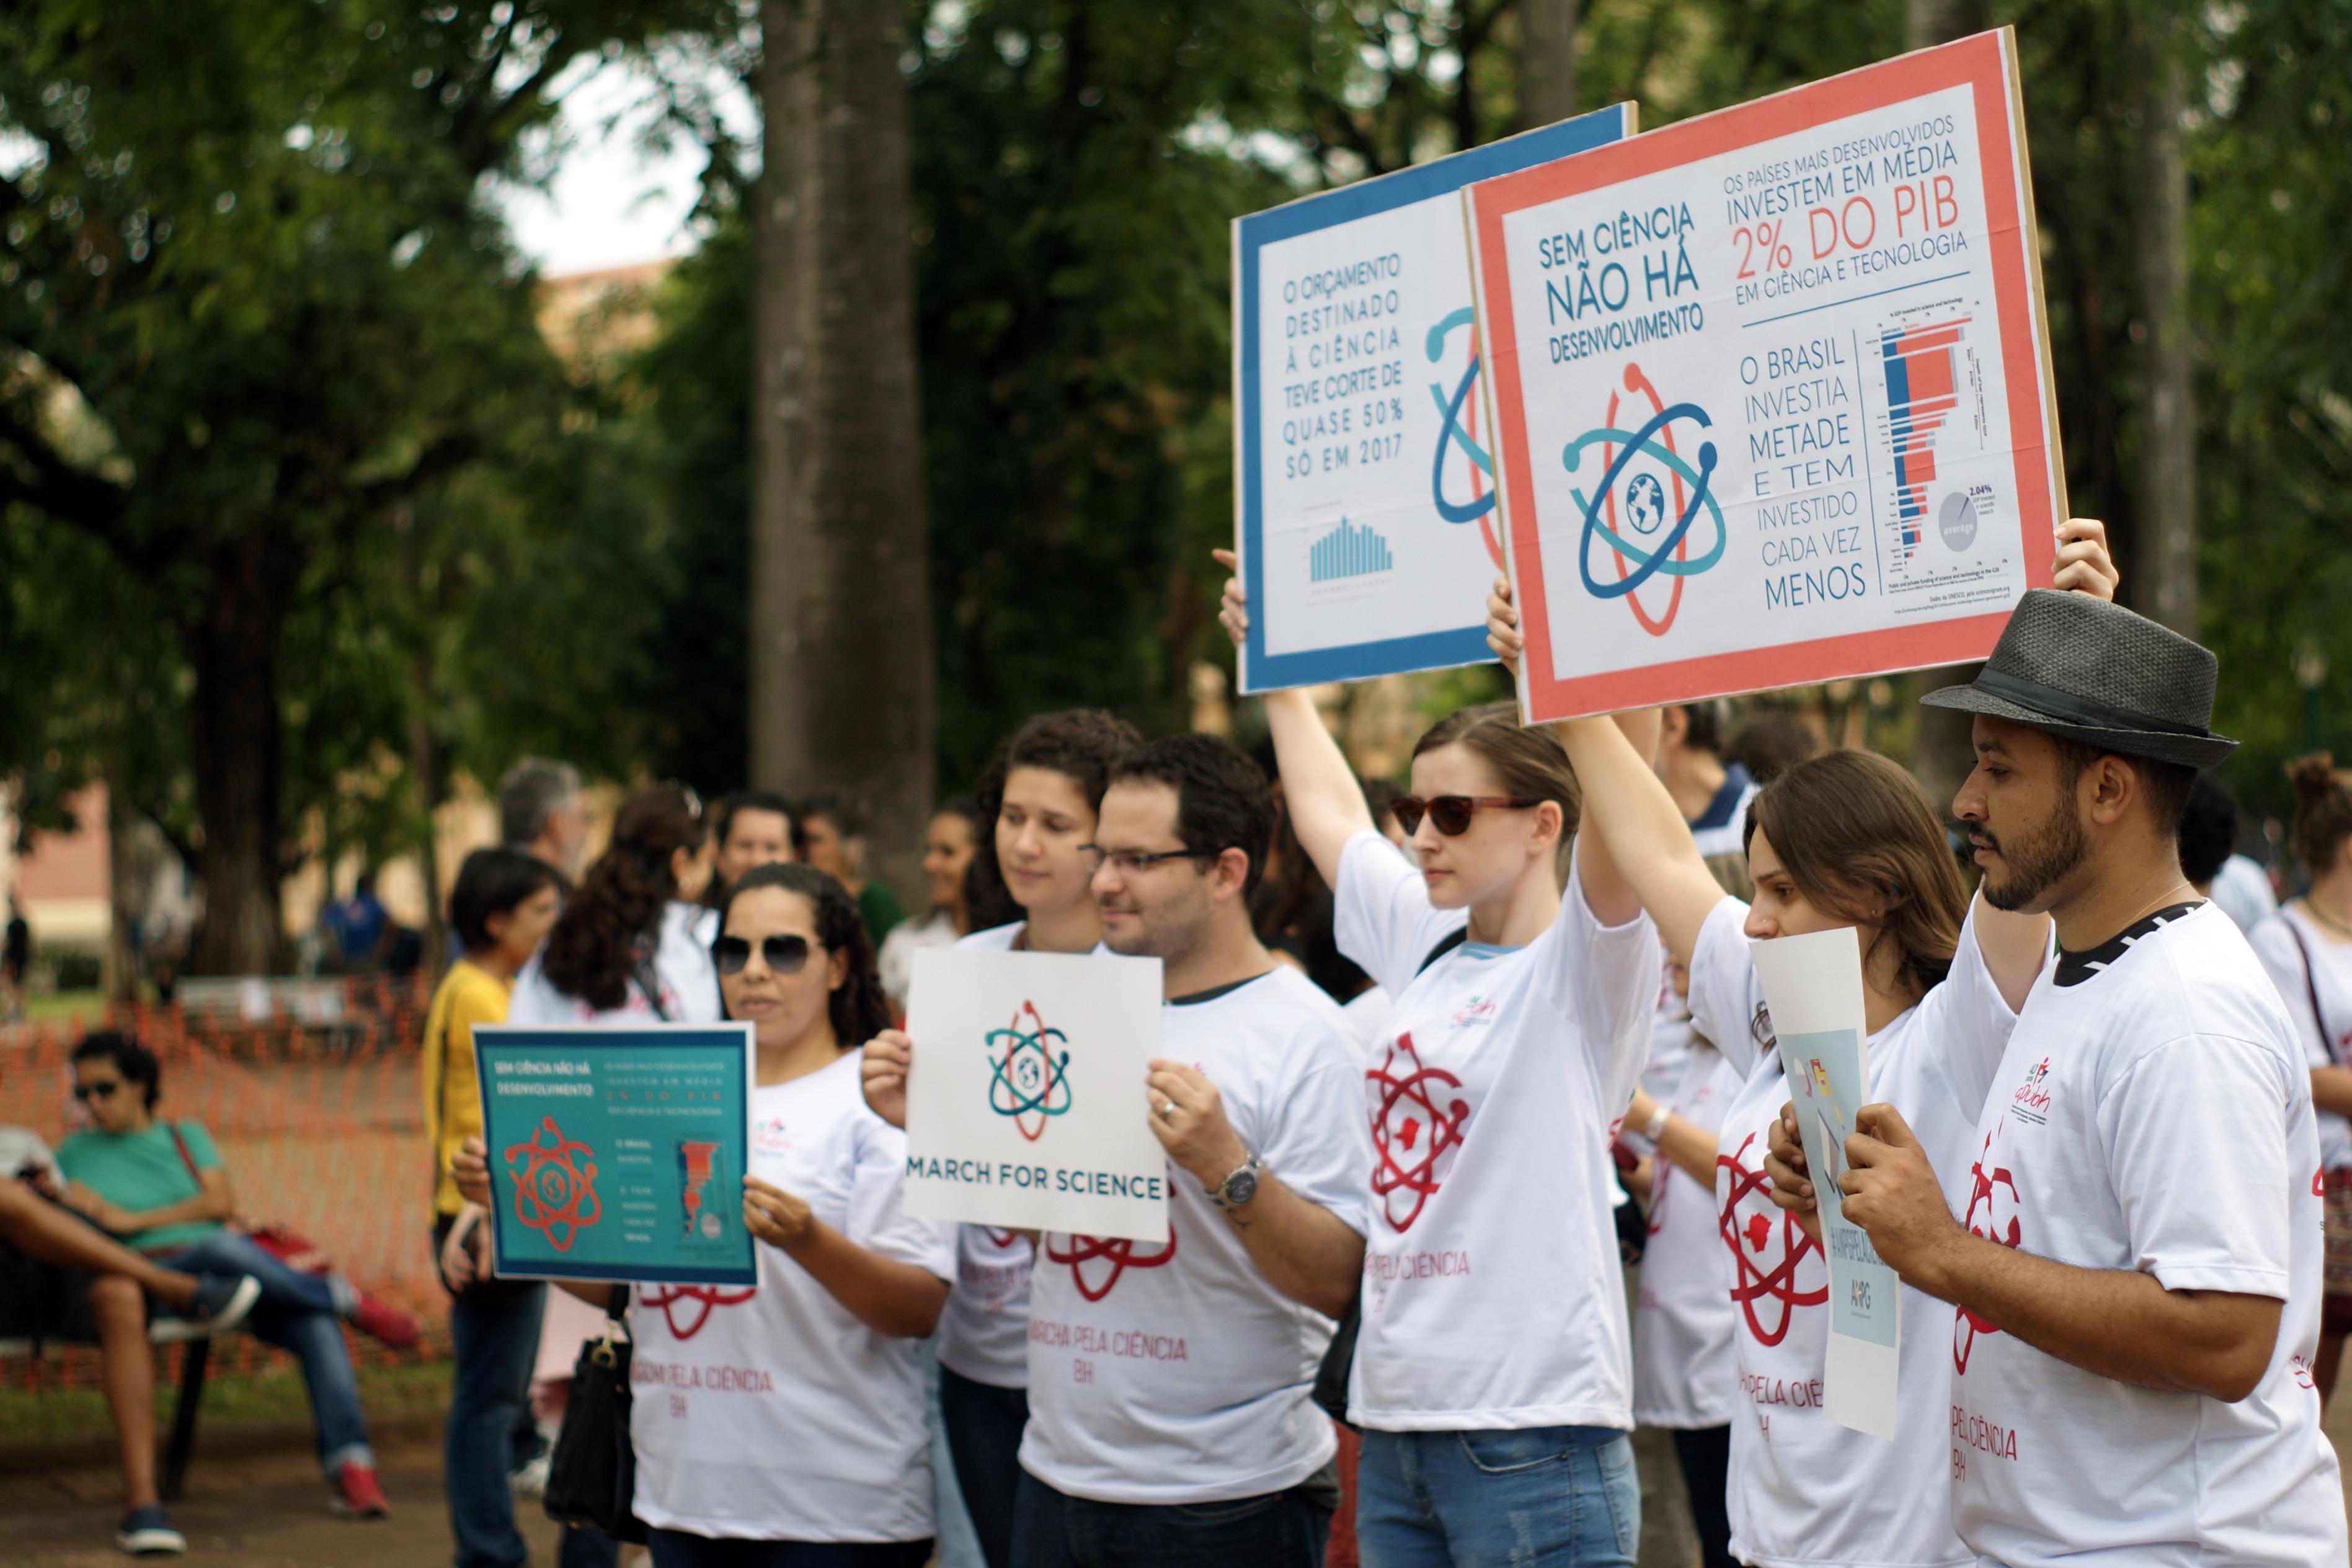 Marcha Pela Ciencia